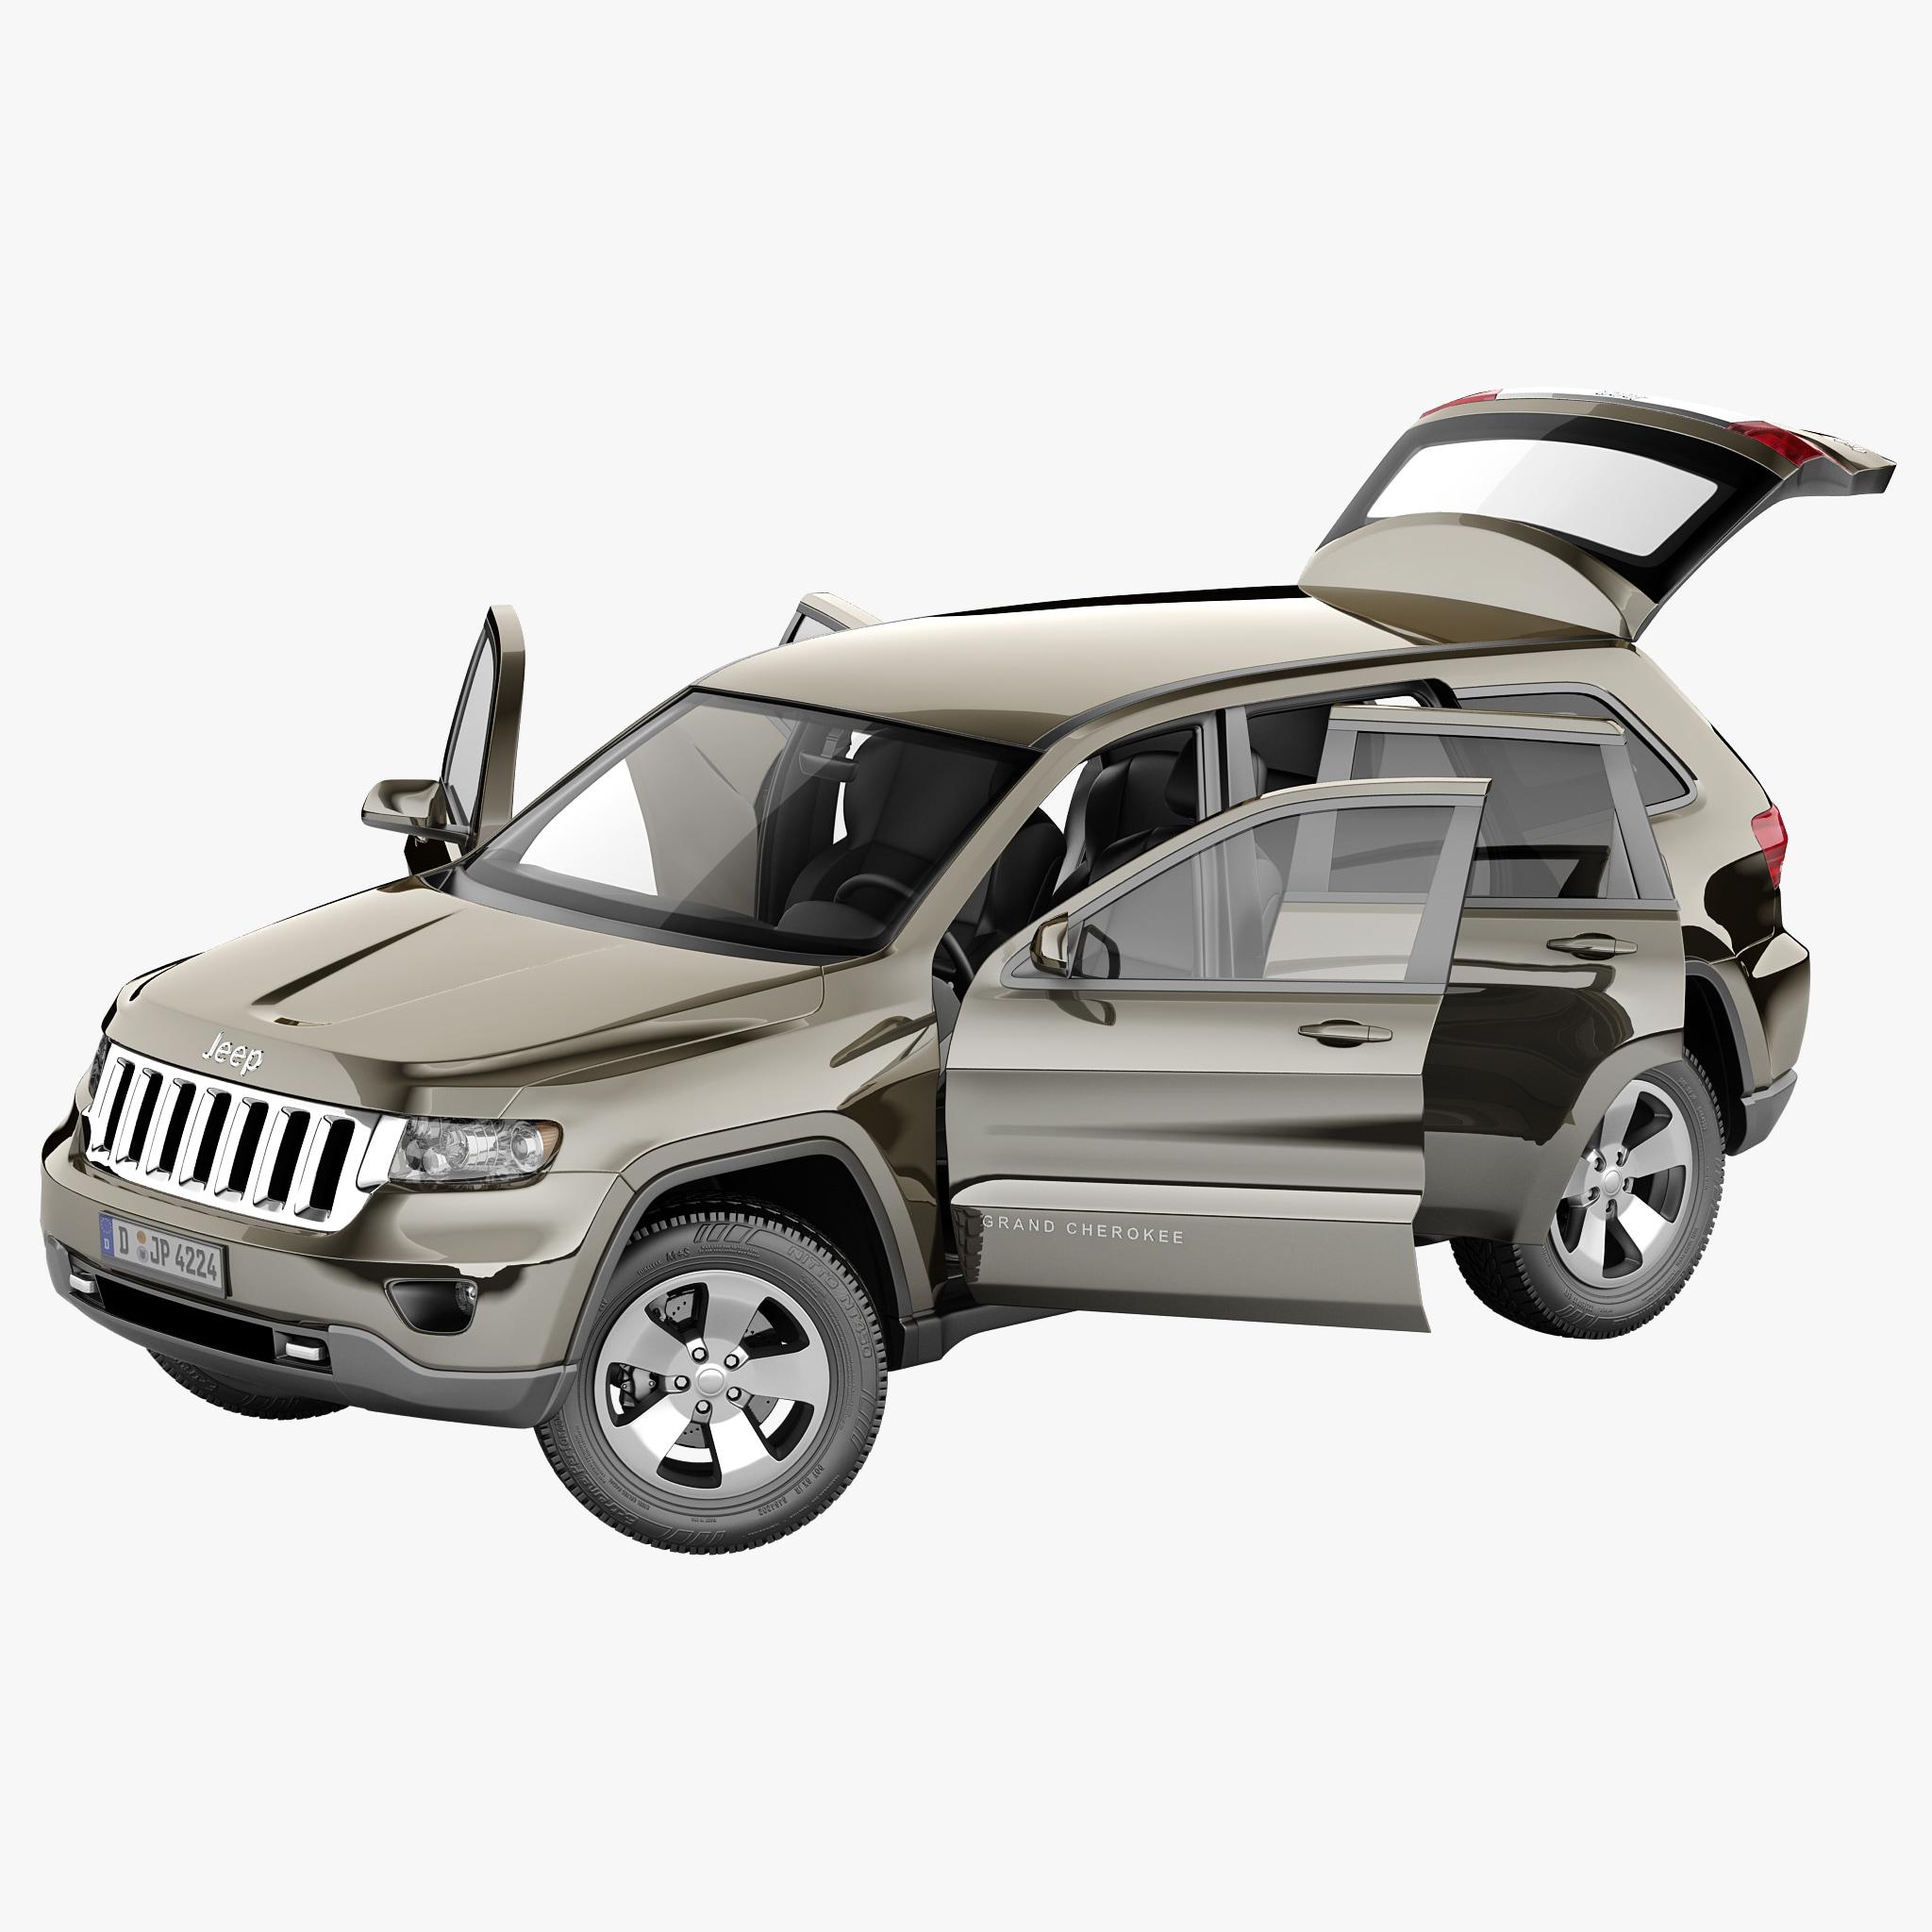 Jeep Grand Cherokee 2012 Rigged_23.jpg